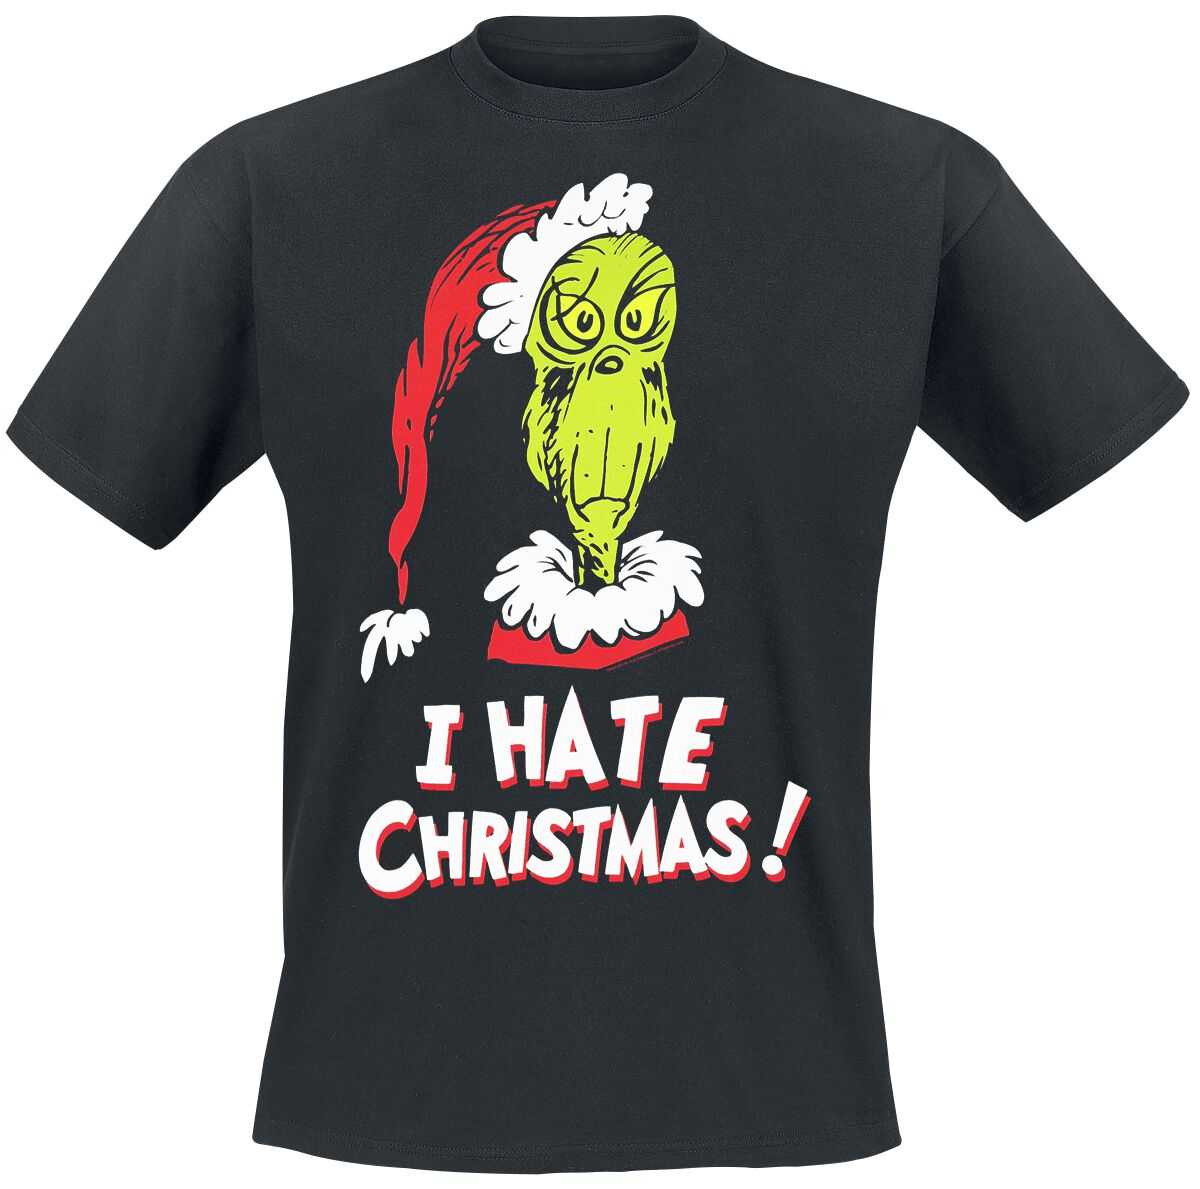 Merch dla Fanów - Koszulki - T-Shirt Der Grinch I Hate Christmas! T-Shirt czarny - 371808